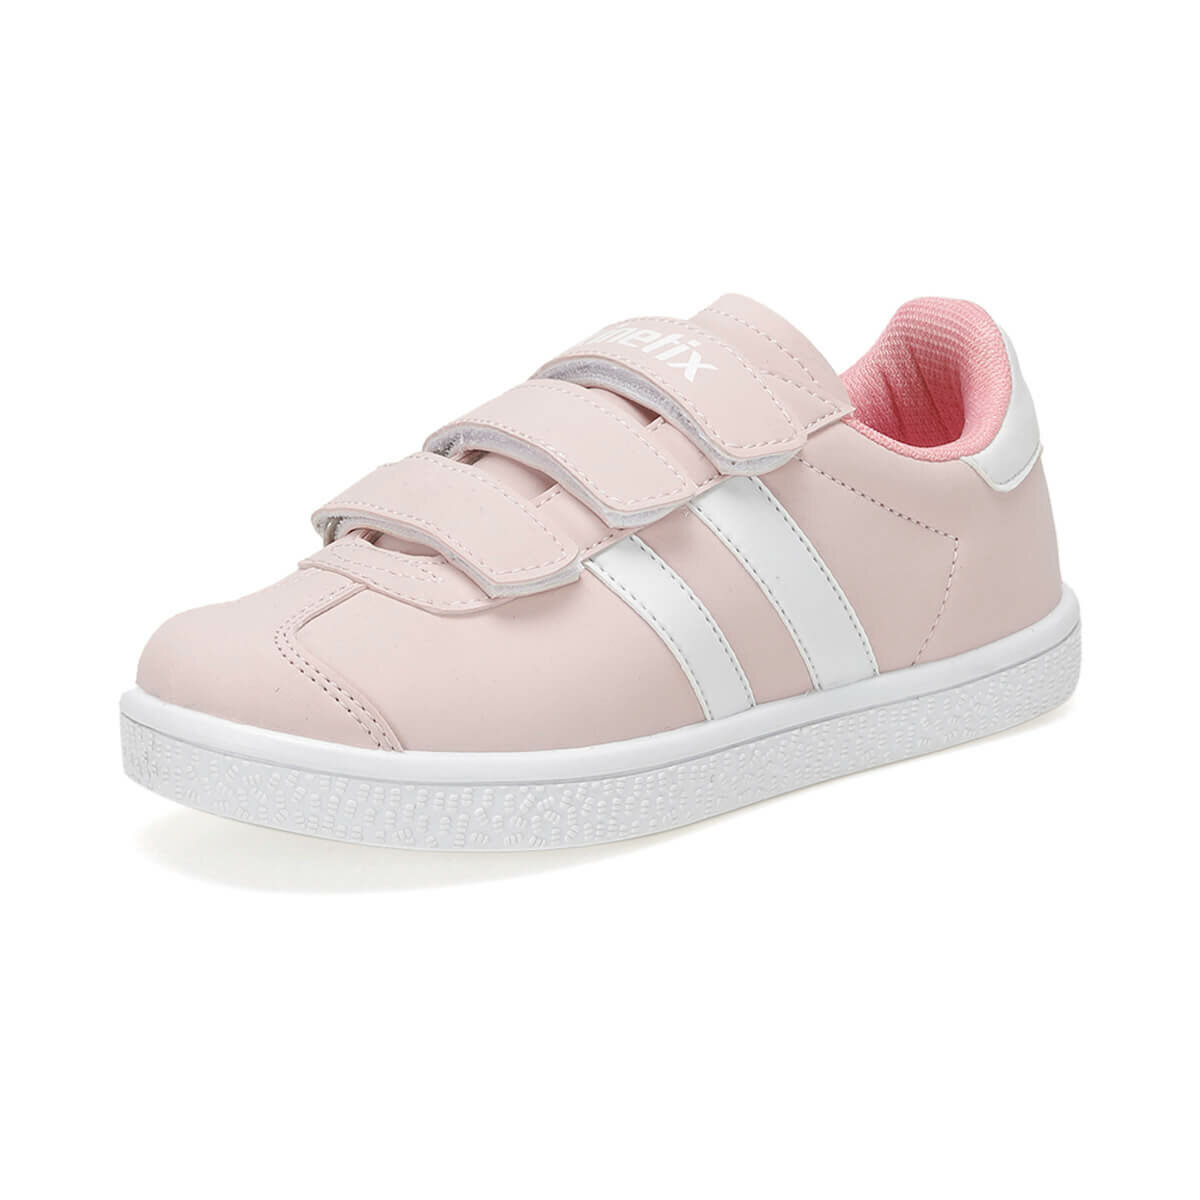 FLO GIZANI PU 9PR Light Pink Female Child Sneaker Shoes KINETIX